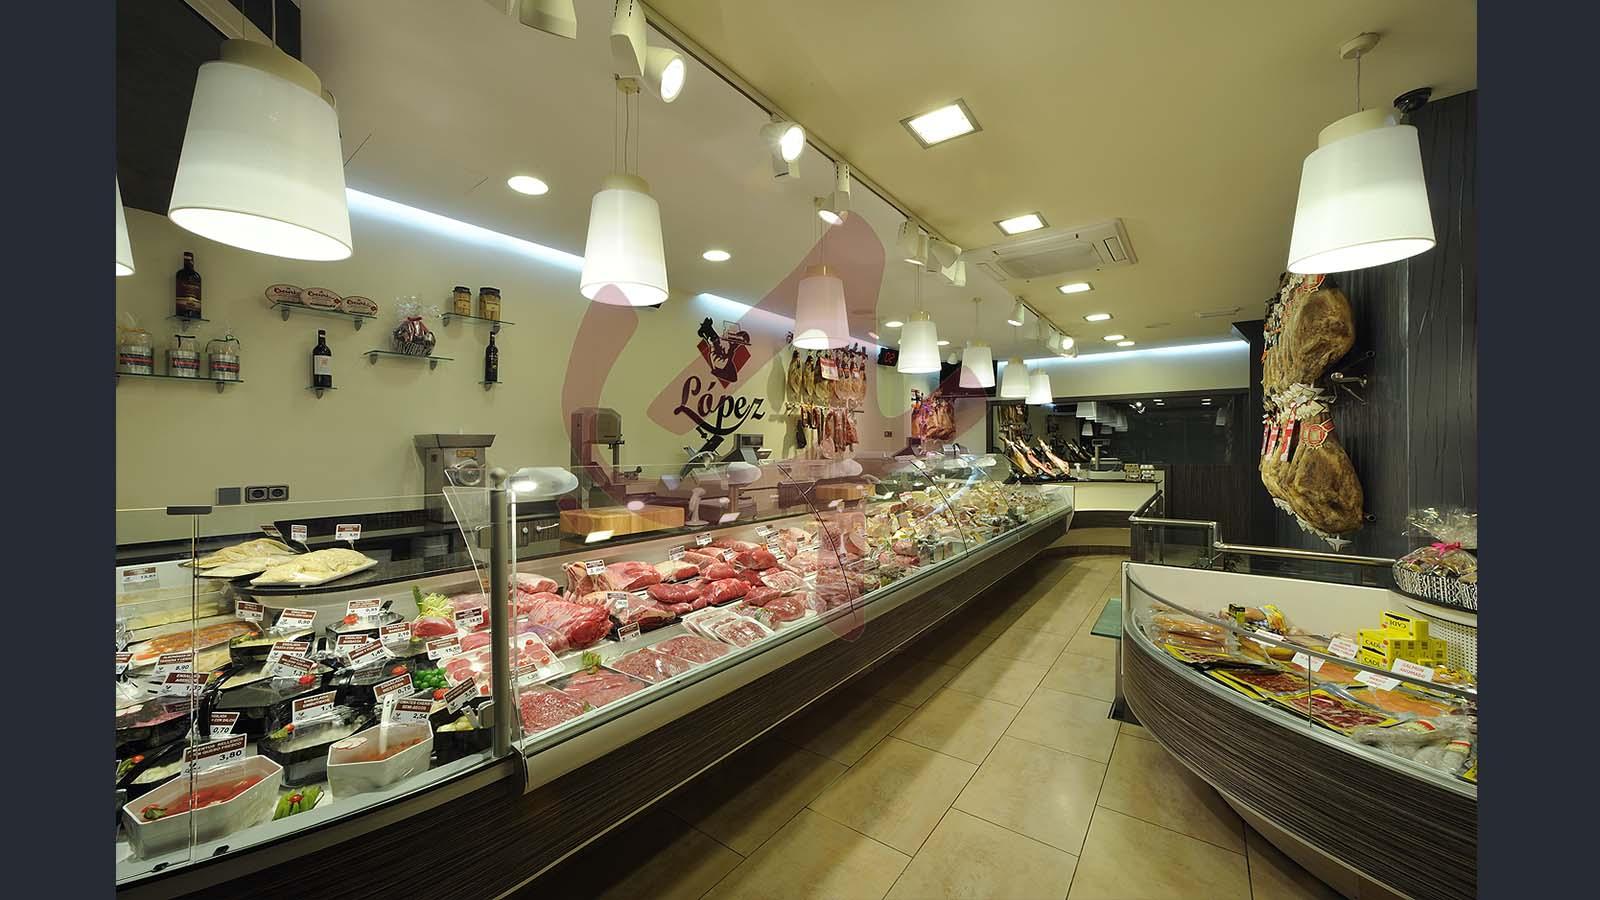 Carnicería Lopez